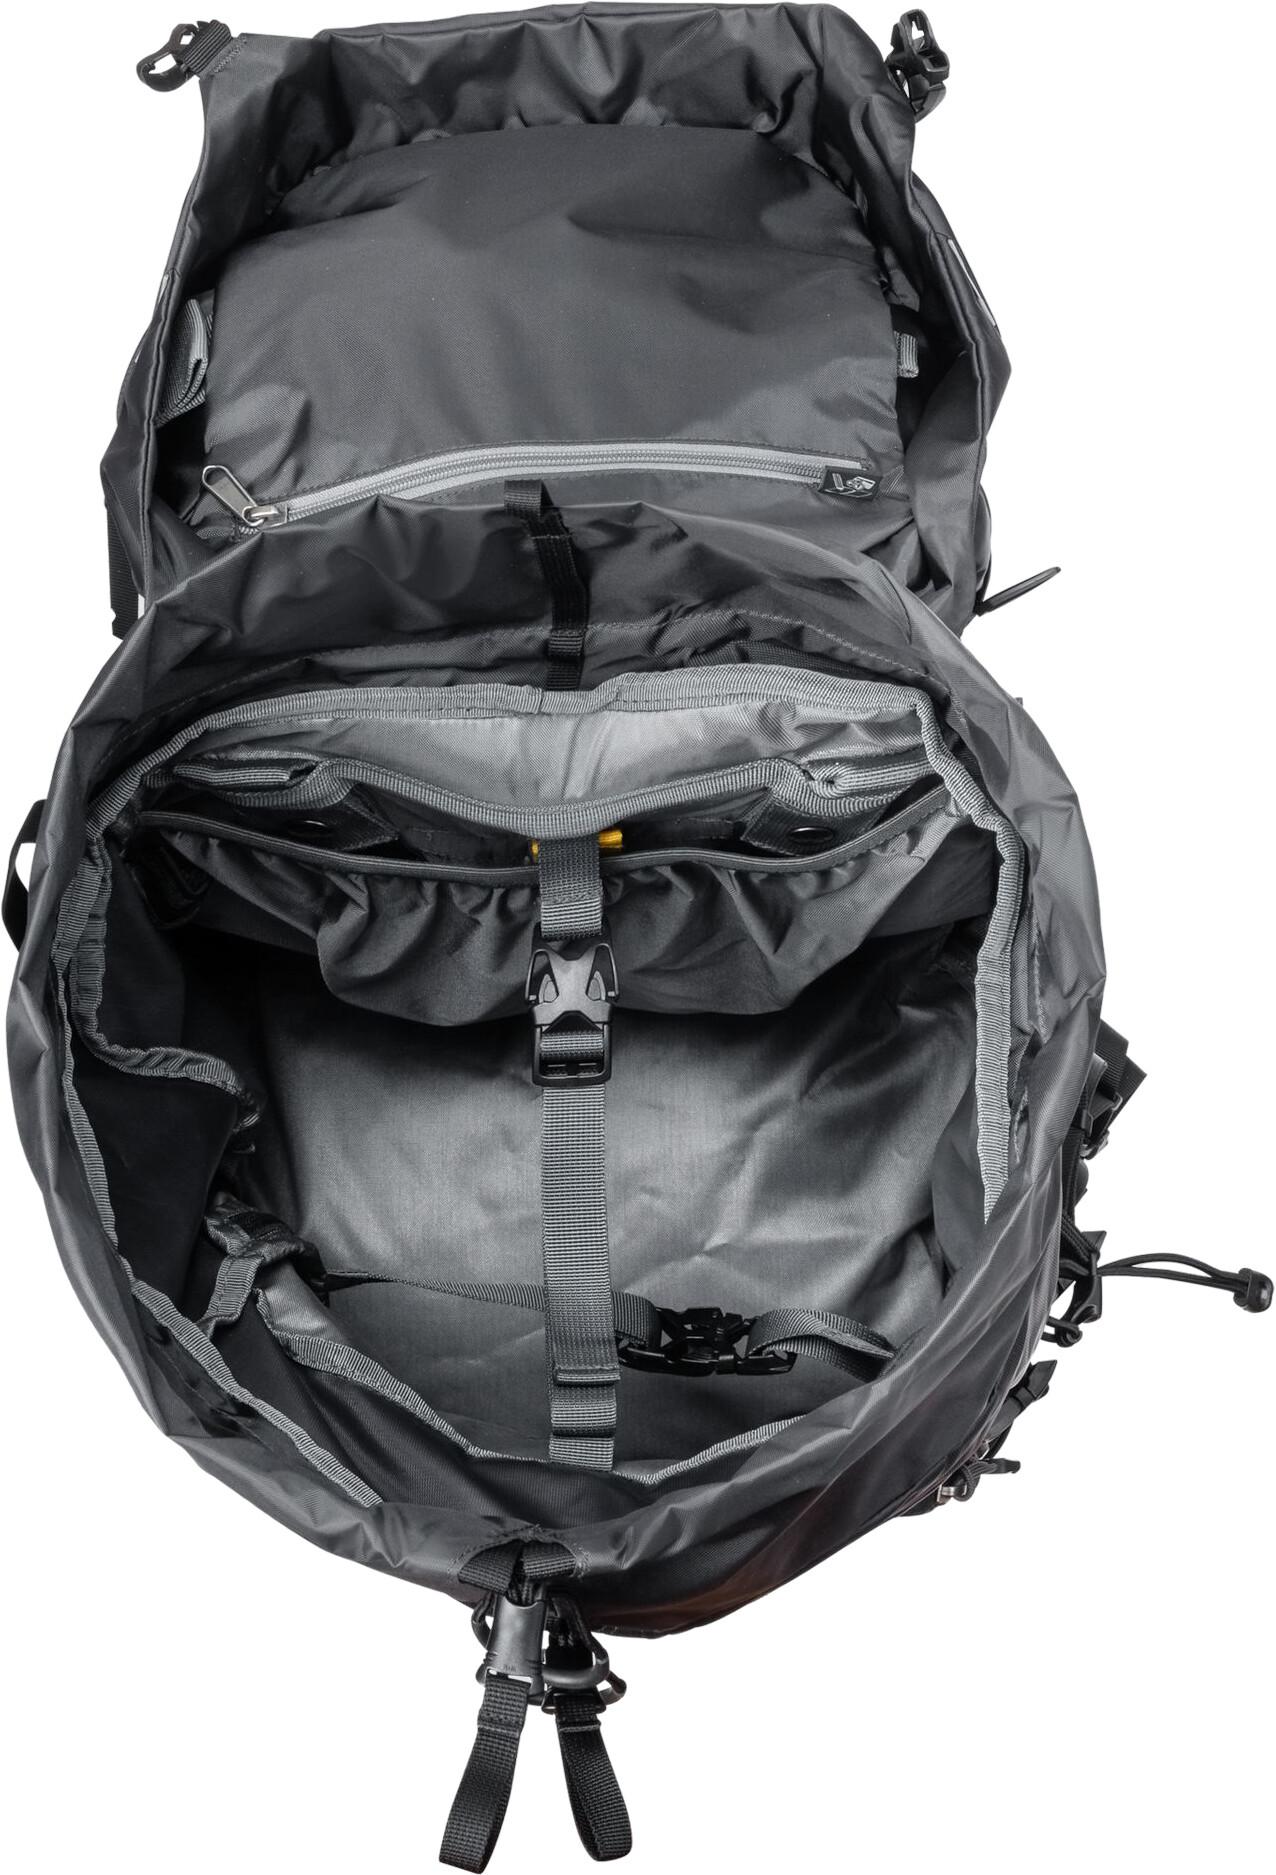 Jack Wolfskin Denali 60 Backpack Damen phantom